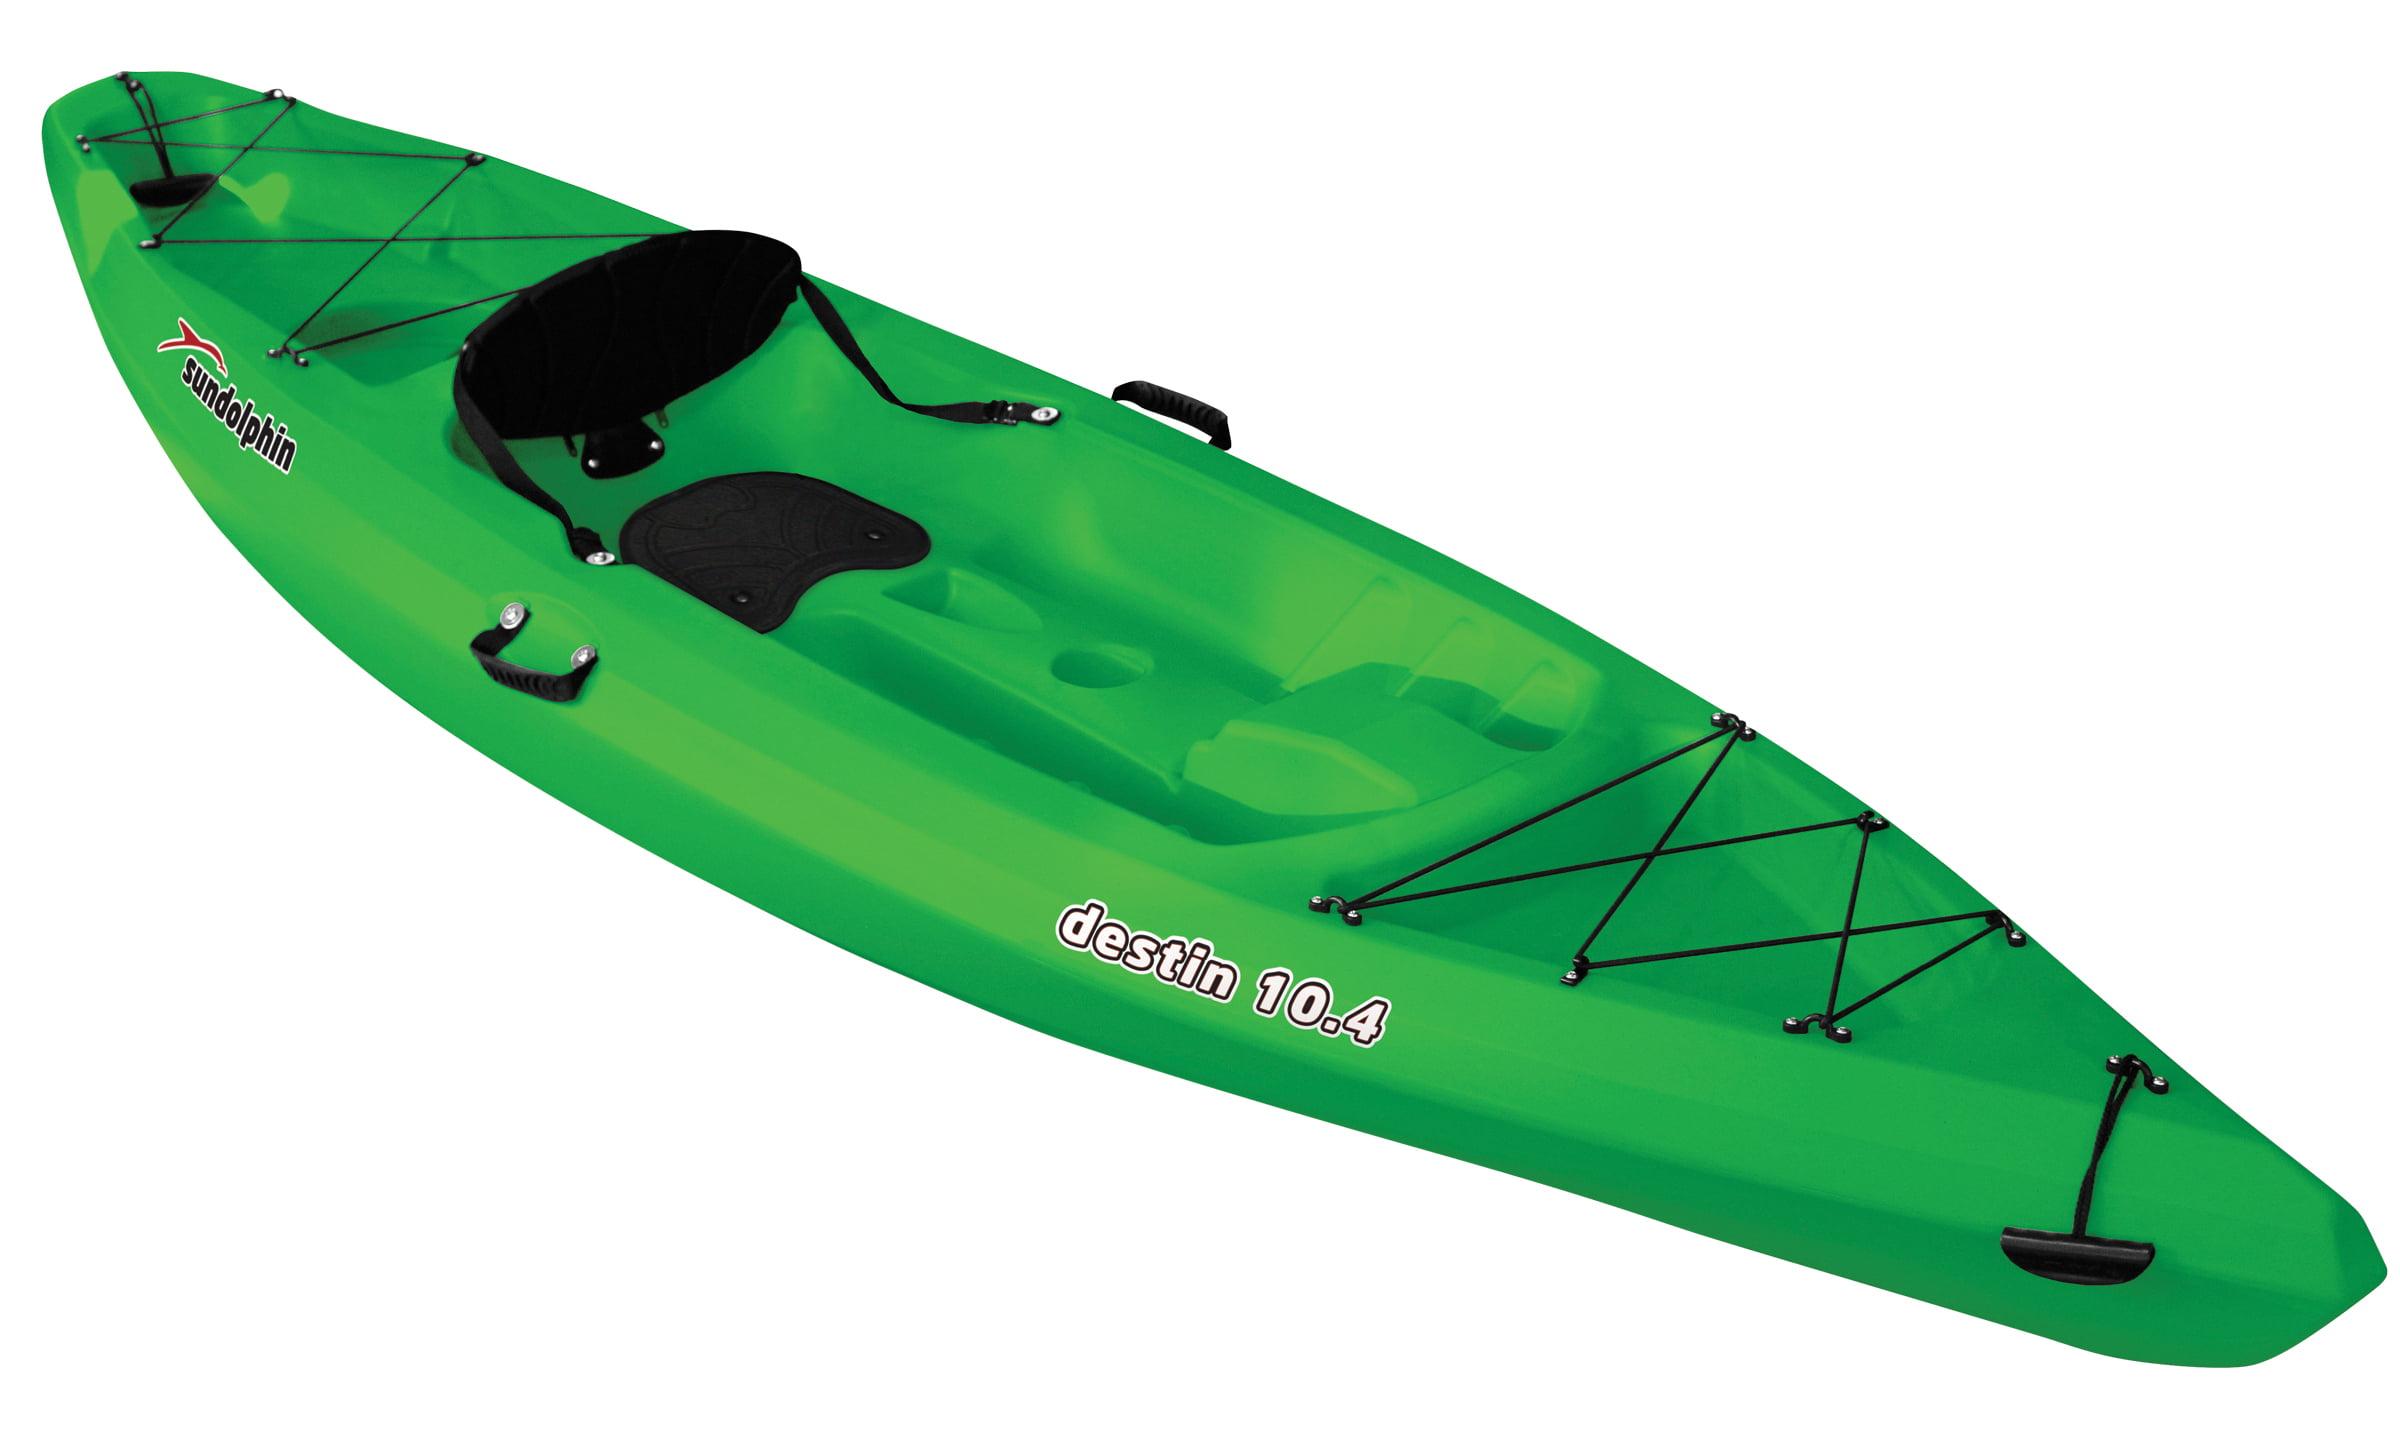 Destin 10.4 Sit-On Recreational Kayak by KL Outdoor